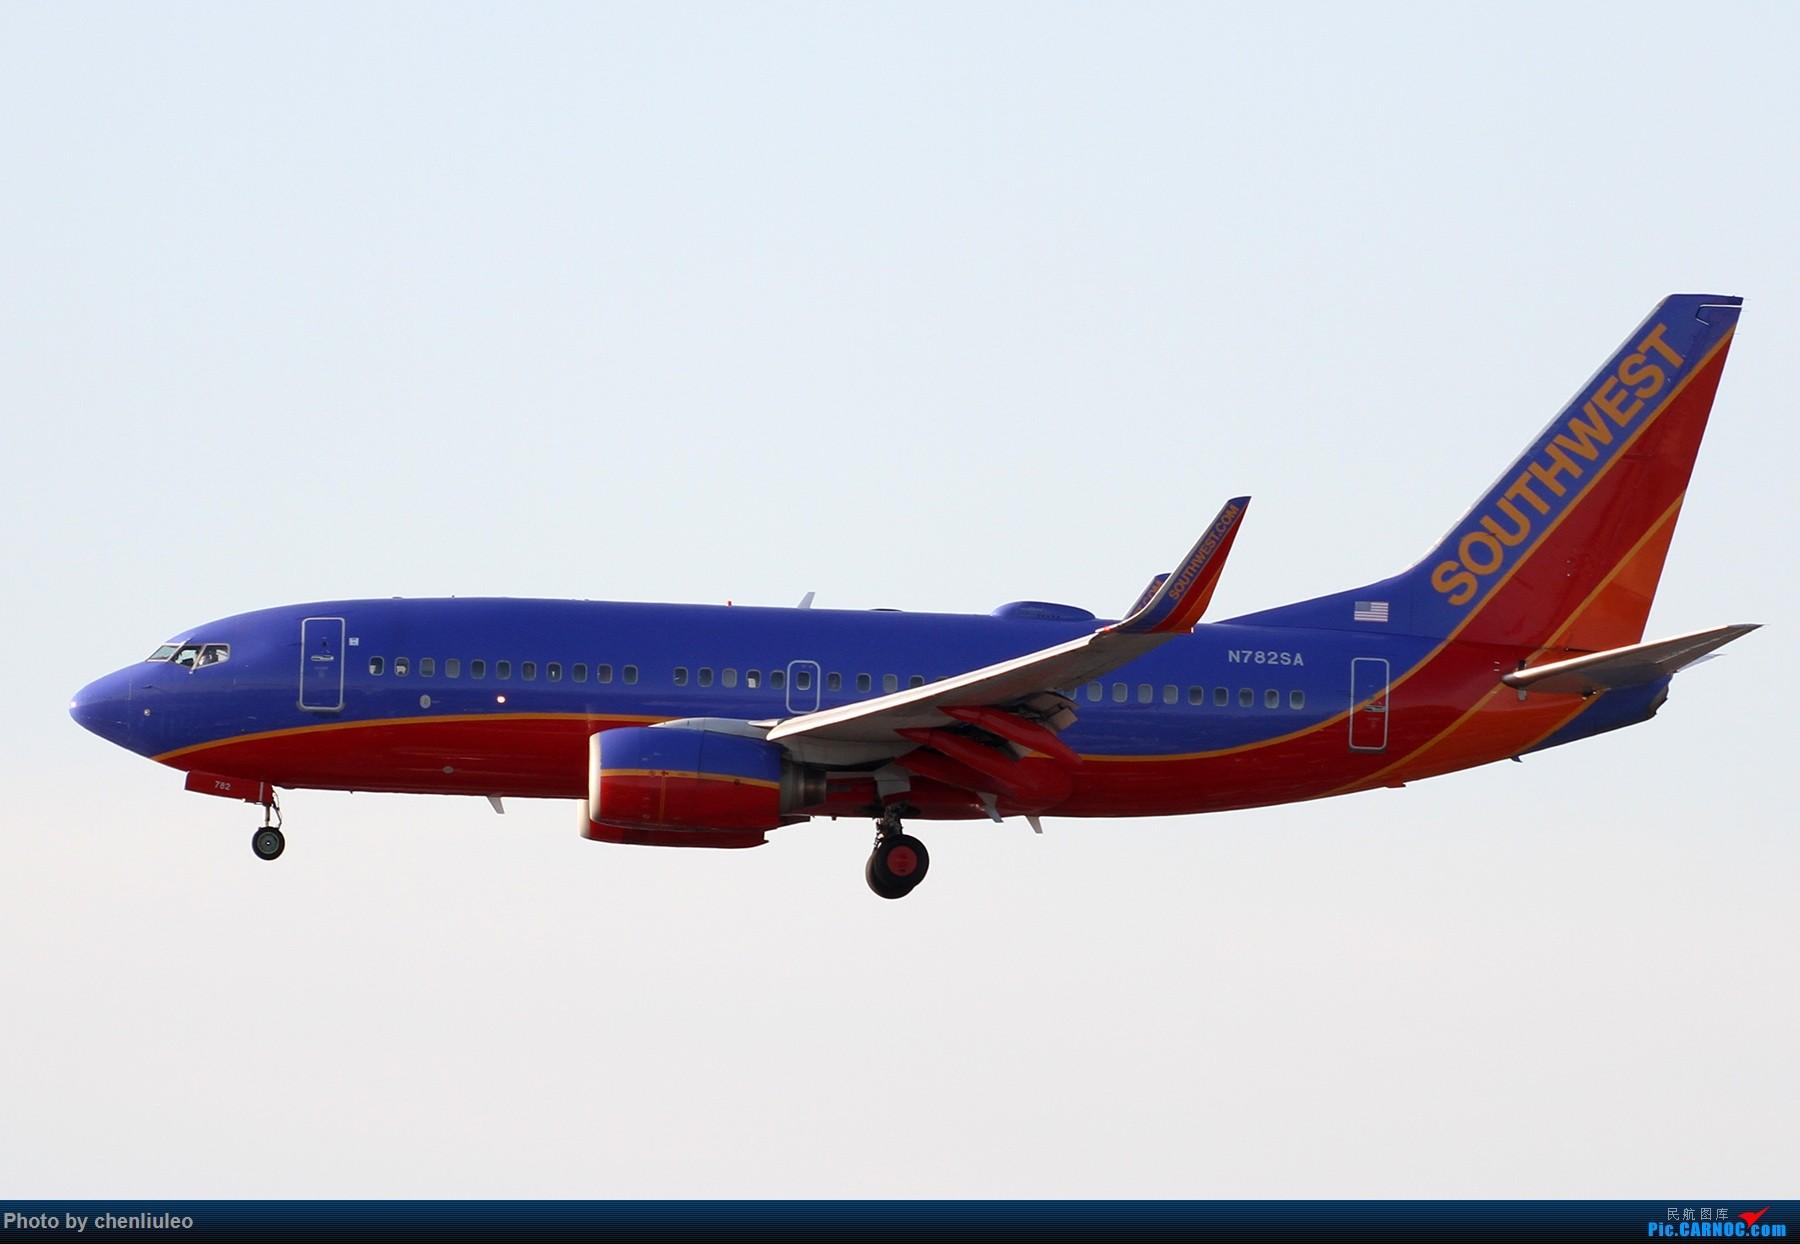 Re:[原创]【北美飞友会】洛杉矶世界机场黄昏随拍 BOEING 737-700 N782SA 美国洛杉矶机场